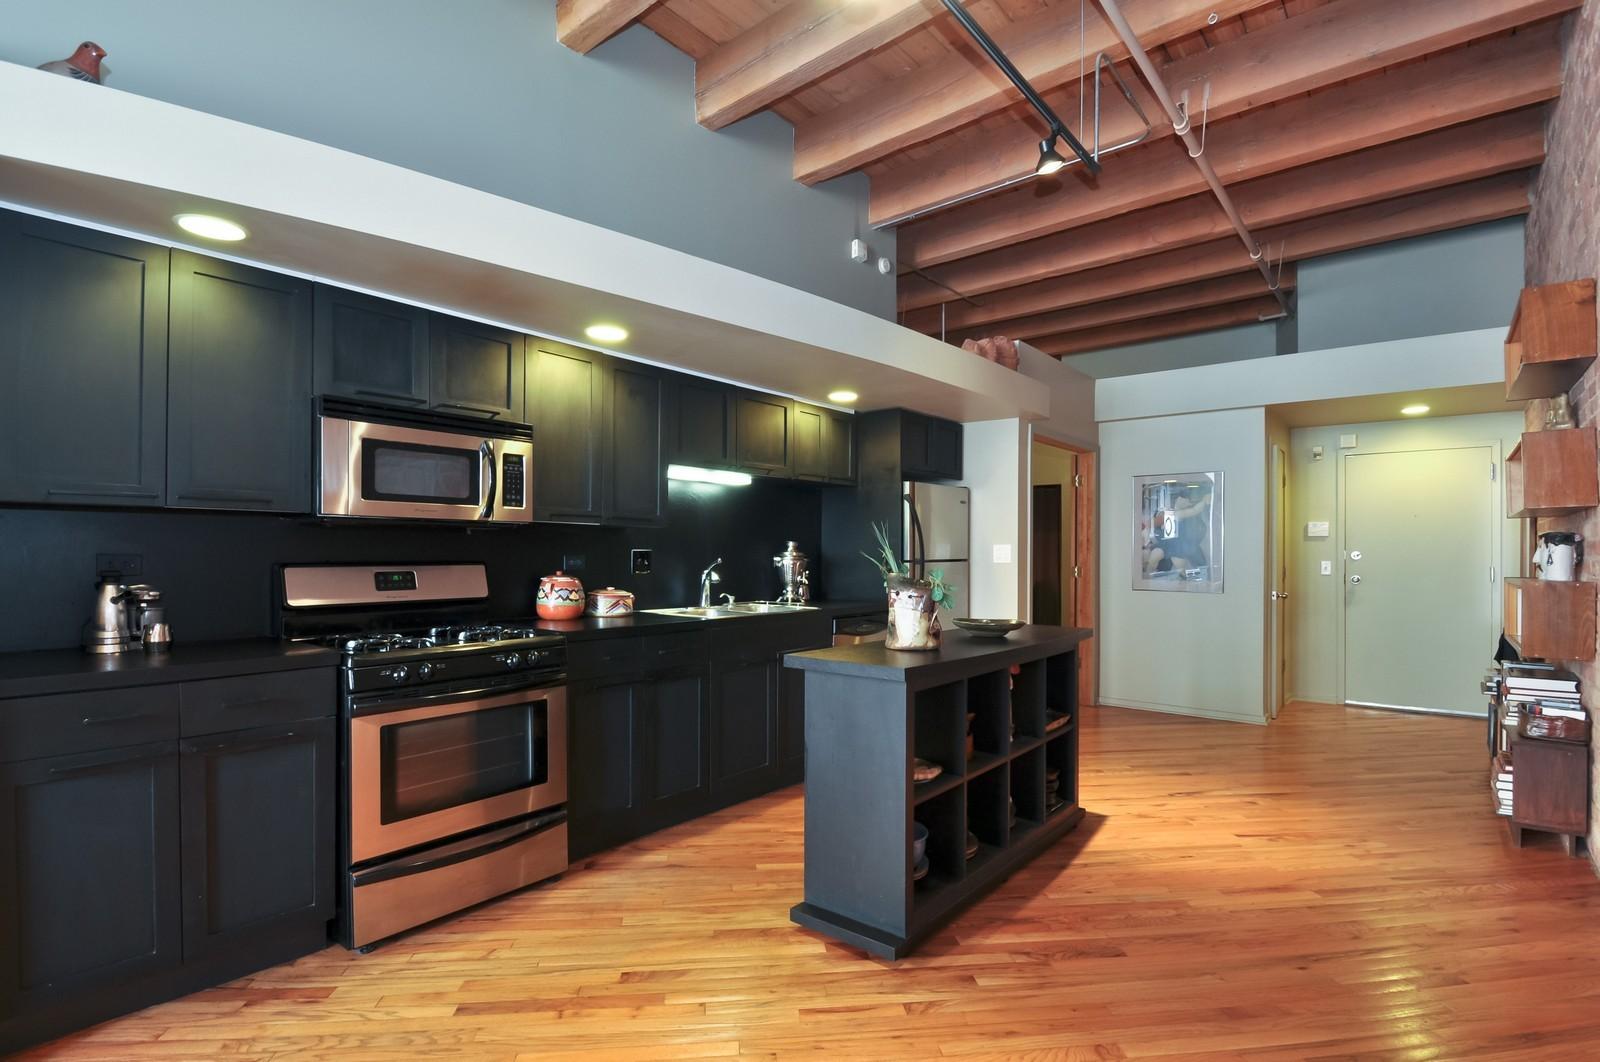 Real Estate Photography - 616 W Fulton, Unit 506, Chicago, IL, 60661 - Kitchen